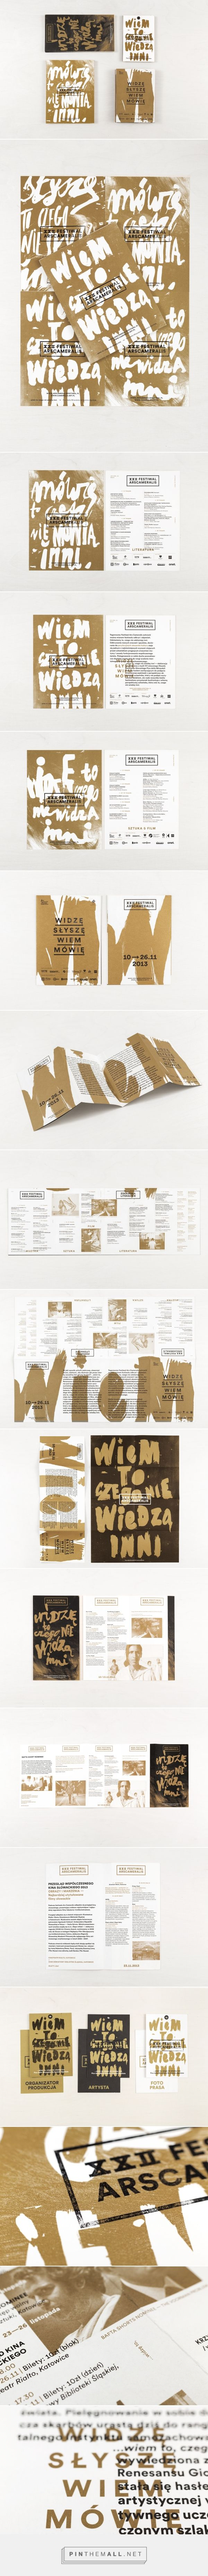 Ars Cameralis Festival 2013 — prints on Behance